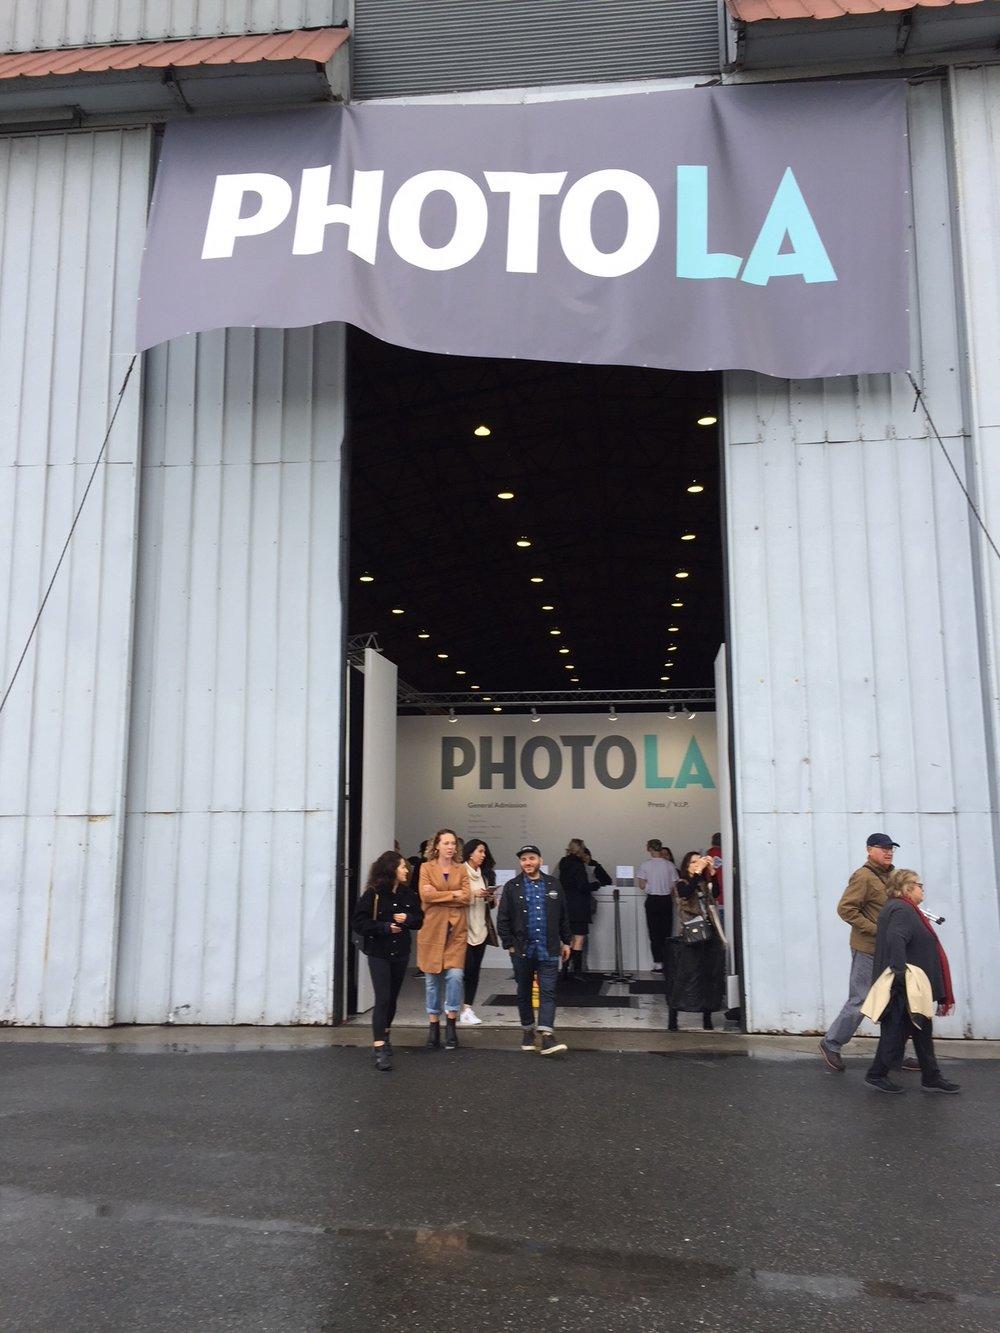 PhotoLA, Sunday, February 3, Barker Hangar  Photo by Judy Arthur